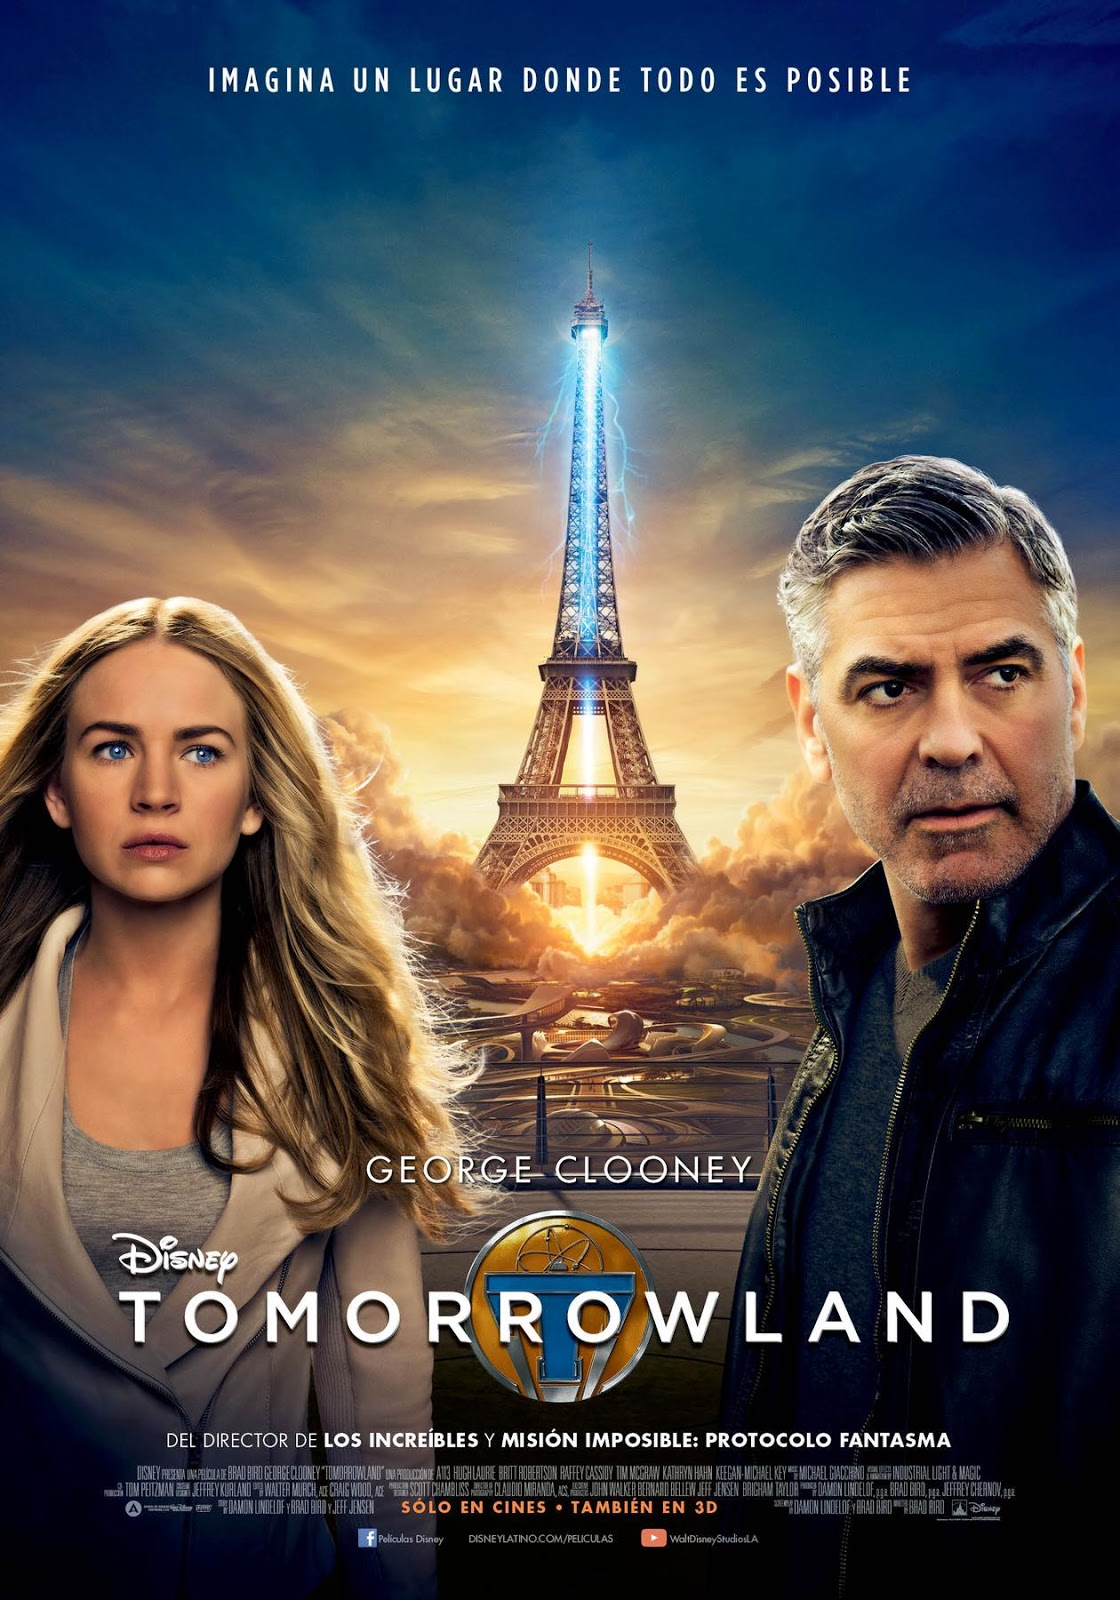 Tomorrowland, el mundo del mañana [DVDRip] [Latino] [1 Link] [MEGA]